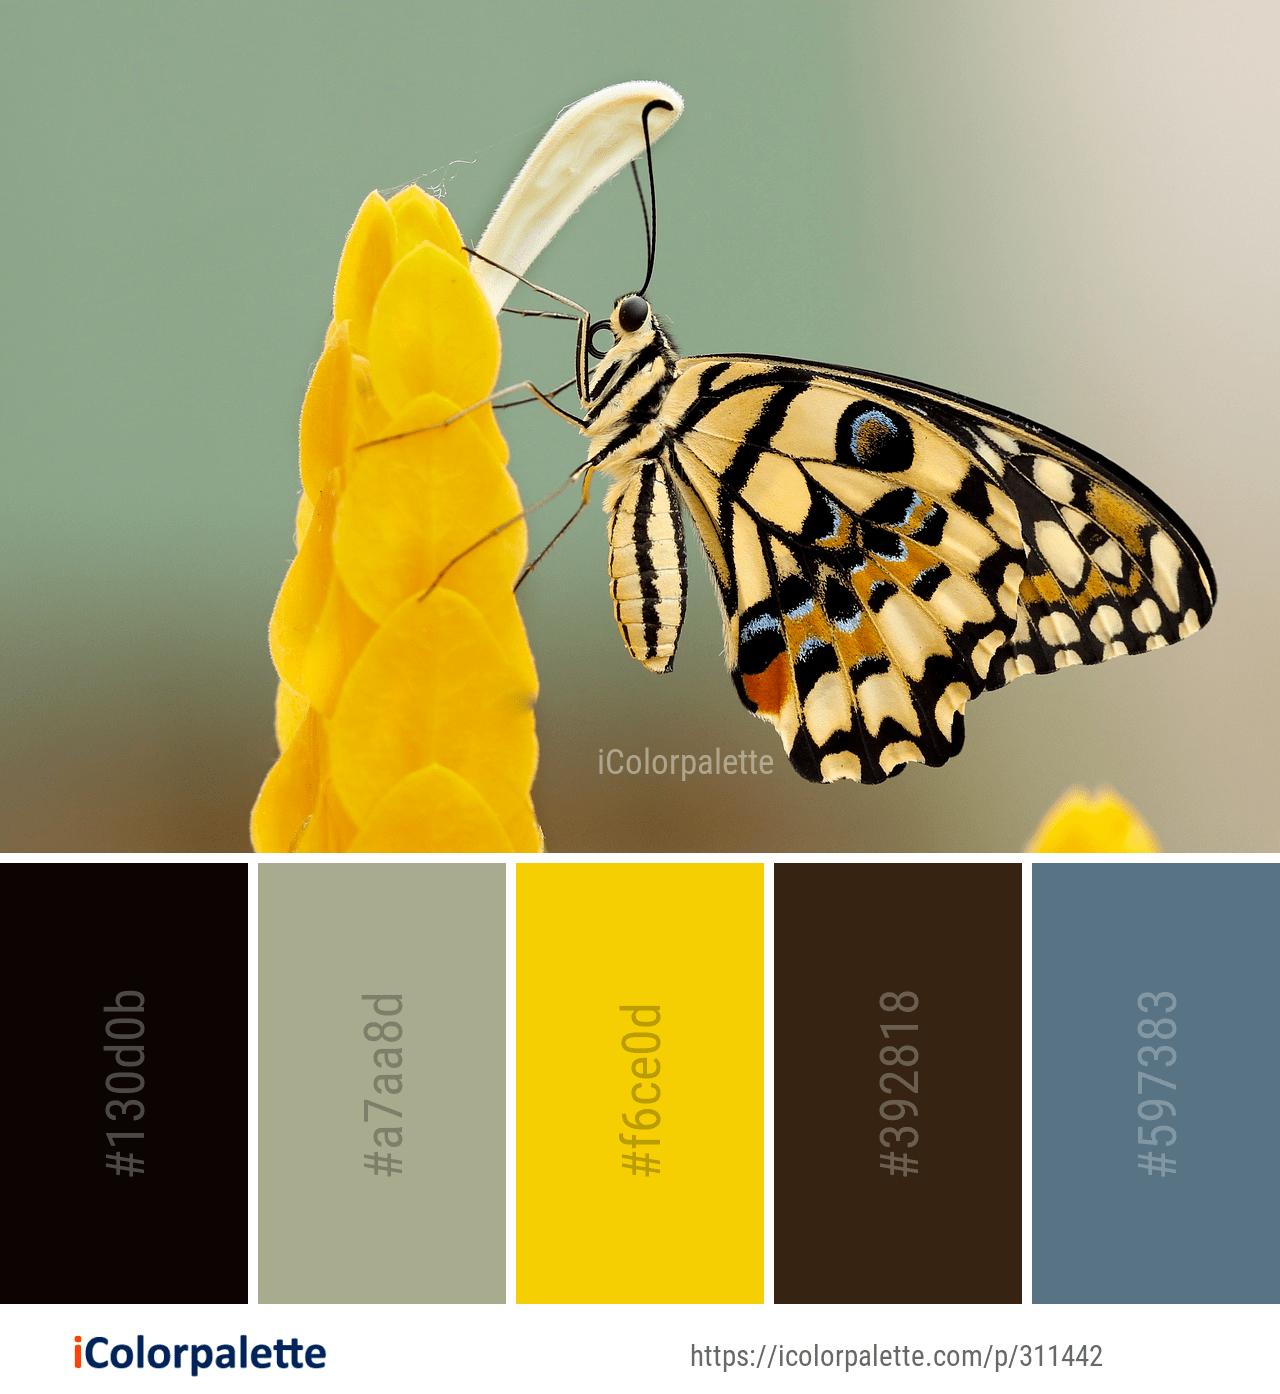 Color Palette ideas #icolorpalette #colors #inspiration #graphics #design #inspiration #beautiful #colorpalette #palettes #idea #color #colorful #colorscheme #colorinspiration #colorcombinations #colorcombos